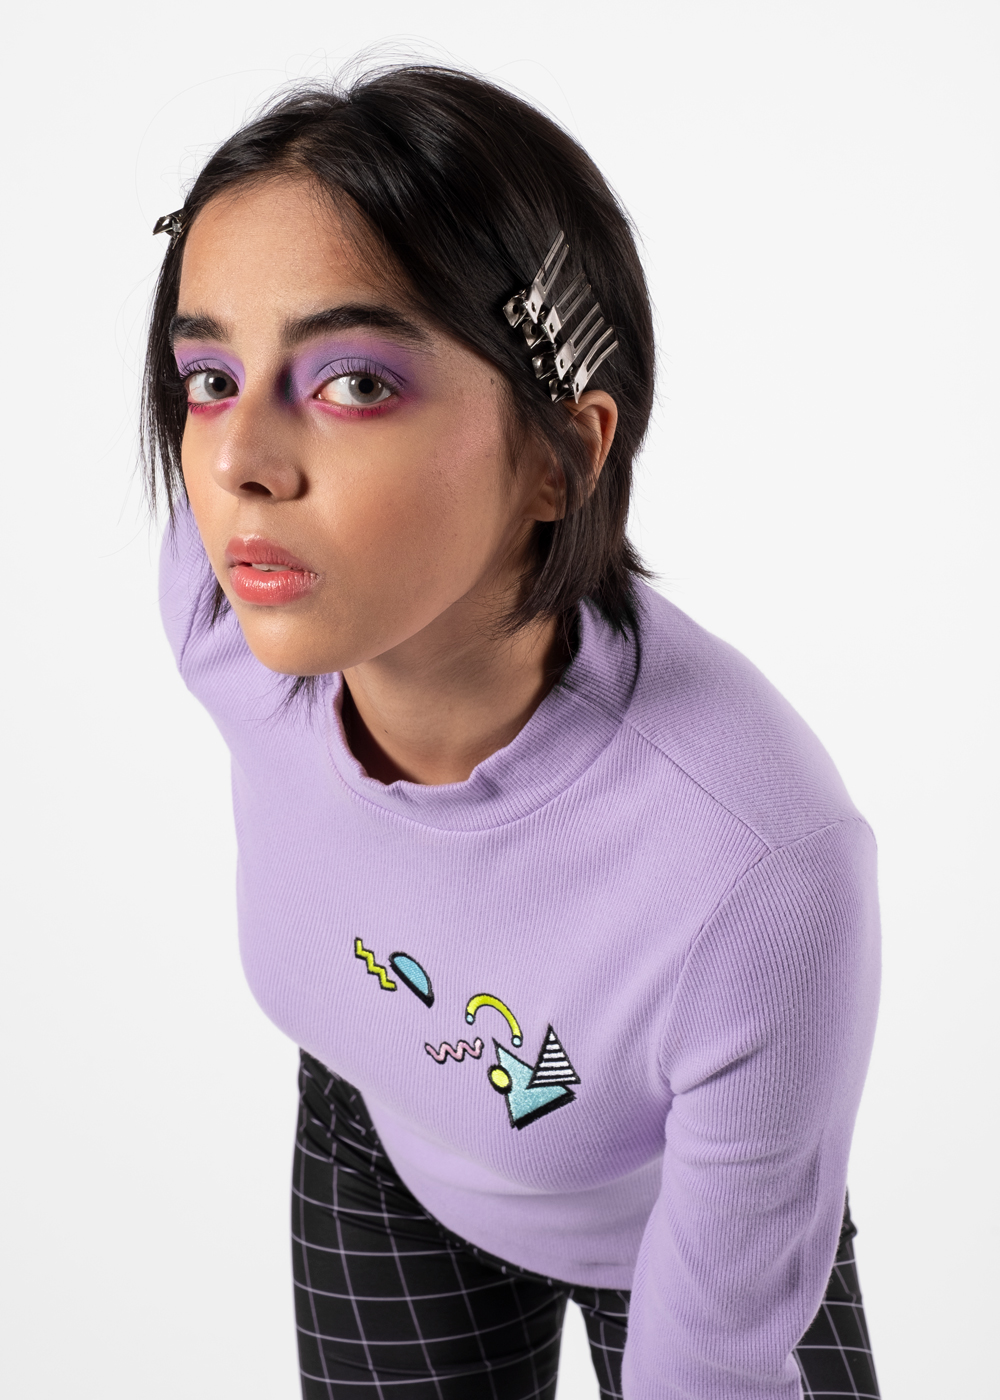 PurpleTop